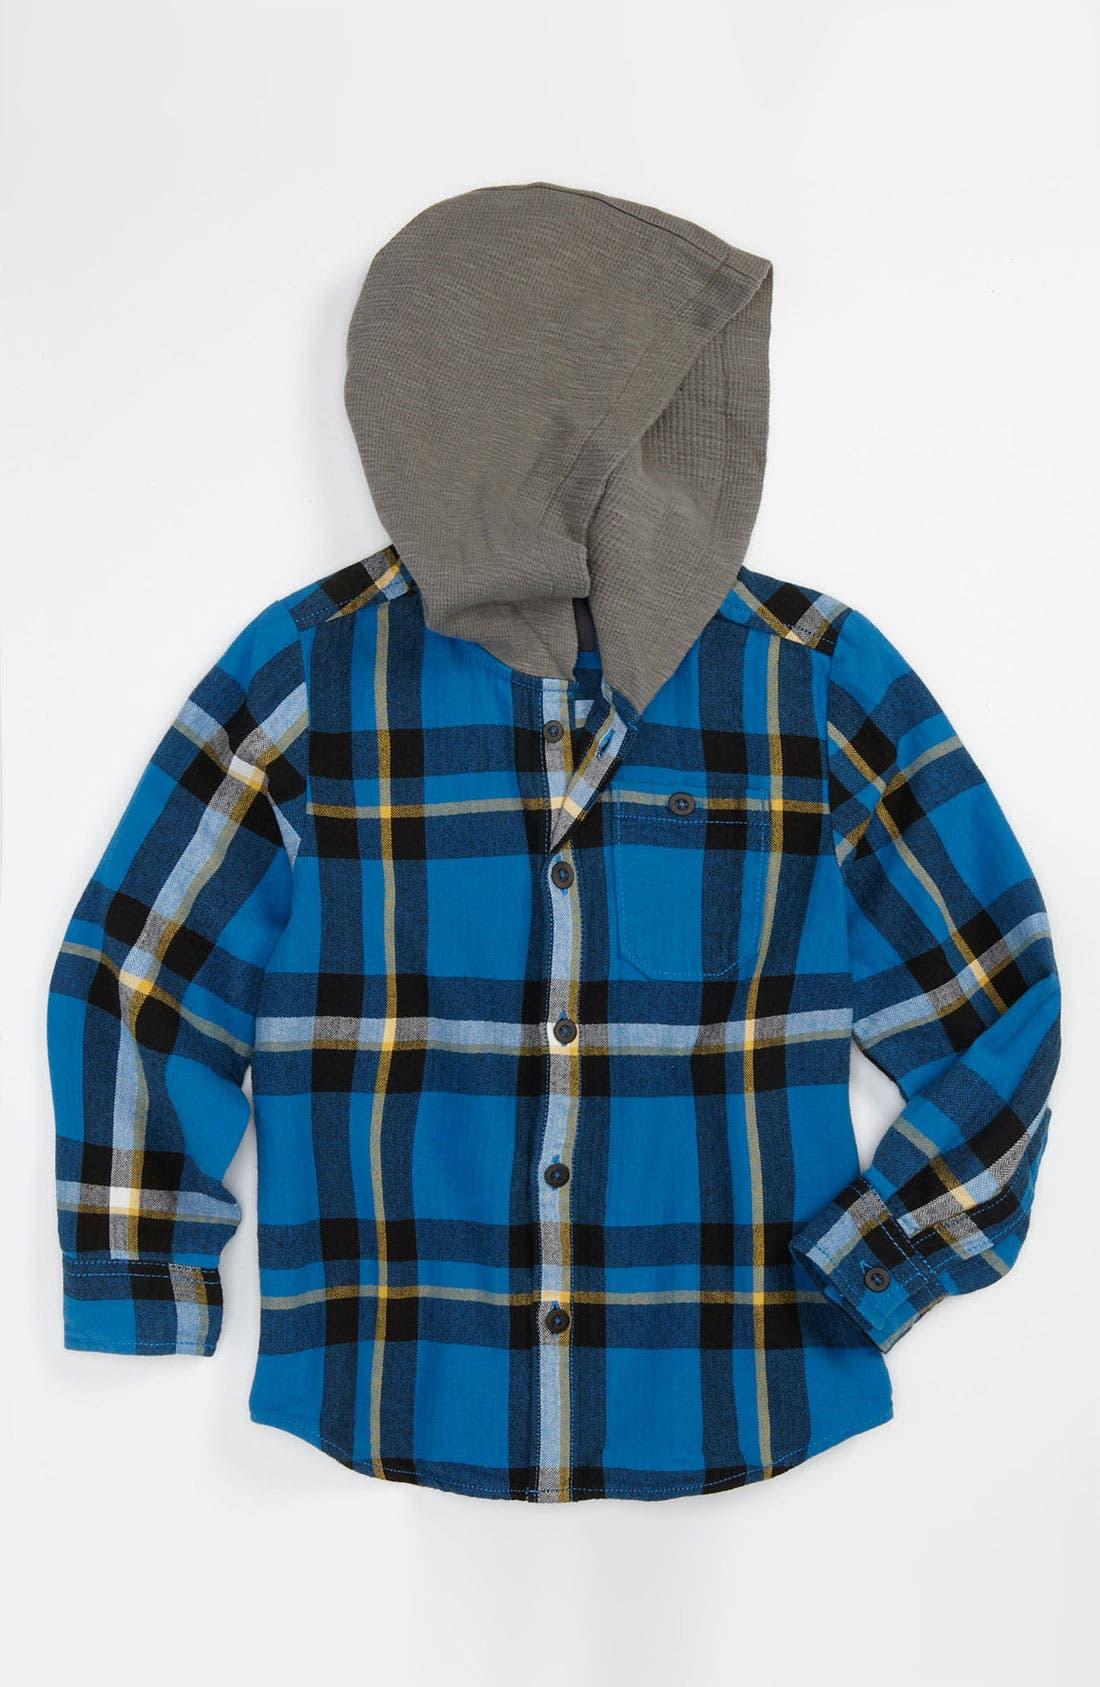 Alternate Image 1 Selected - Pure Stuff 'Hunter' Woven Shirt (Big Boys)